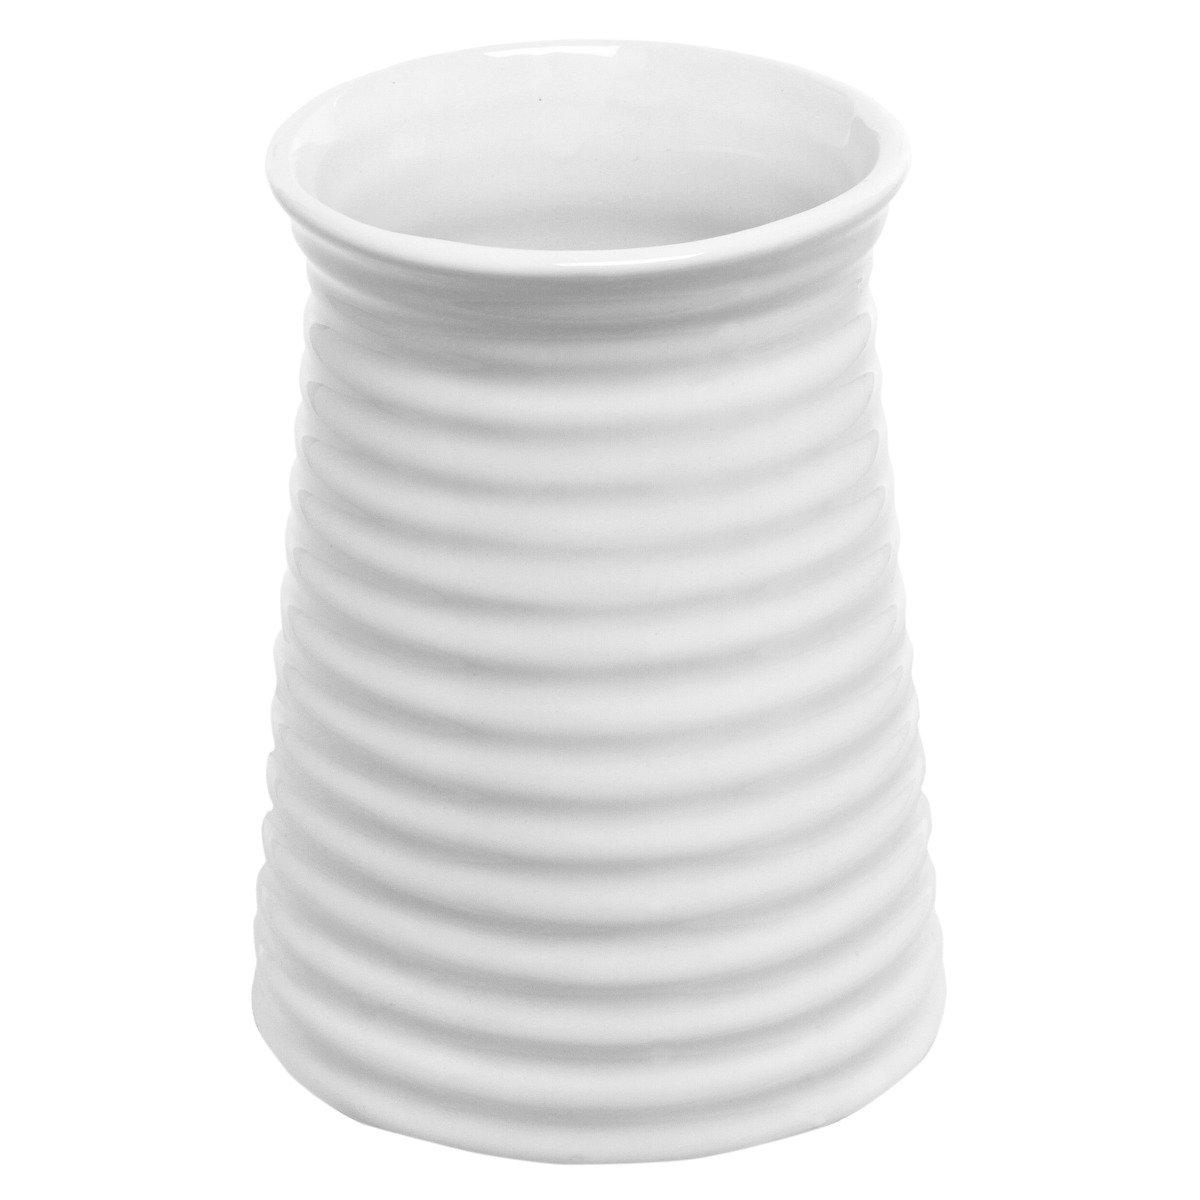 5.7 inch Modern Ribbed Design Small White Ceramic Decorative Tabletop Centerpiece Vase / Flower Pot